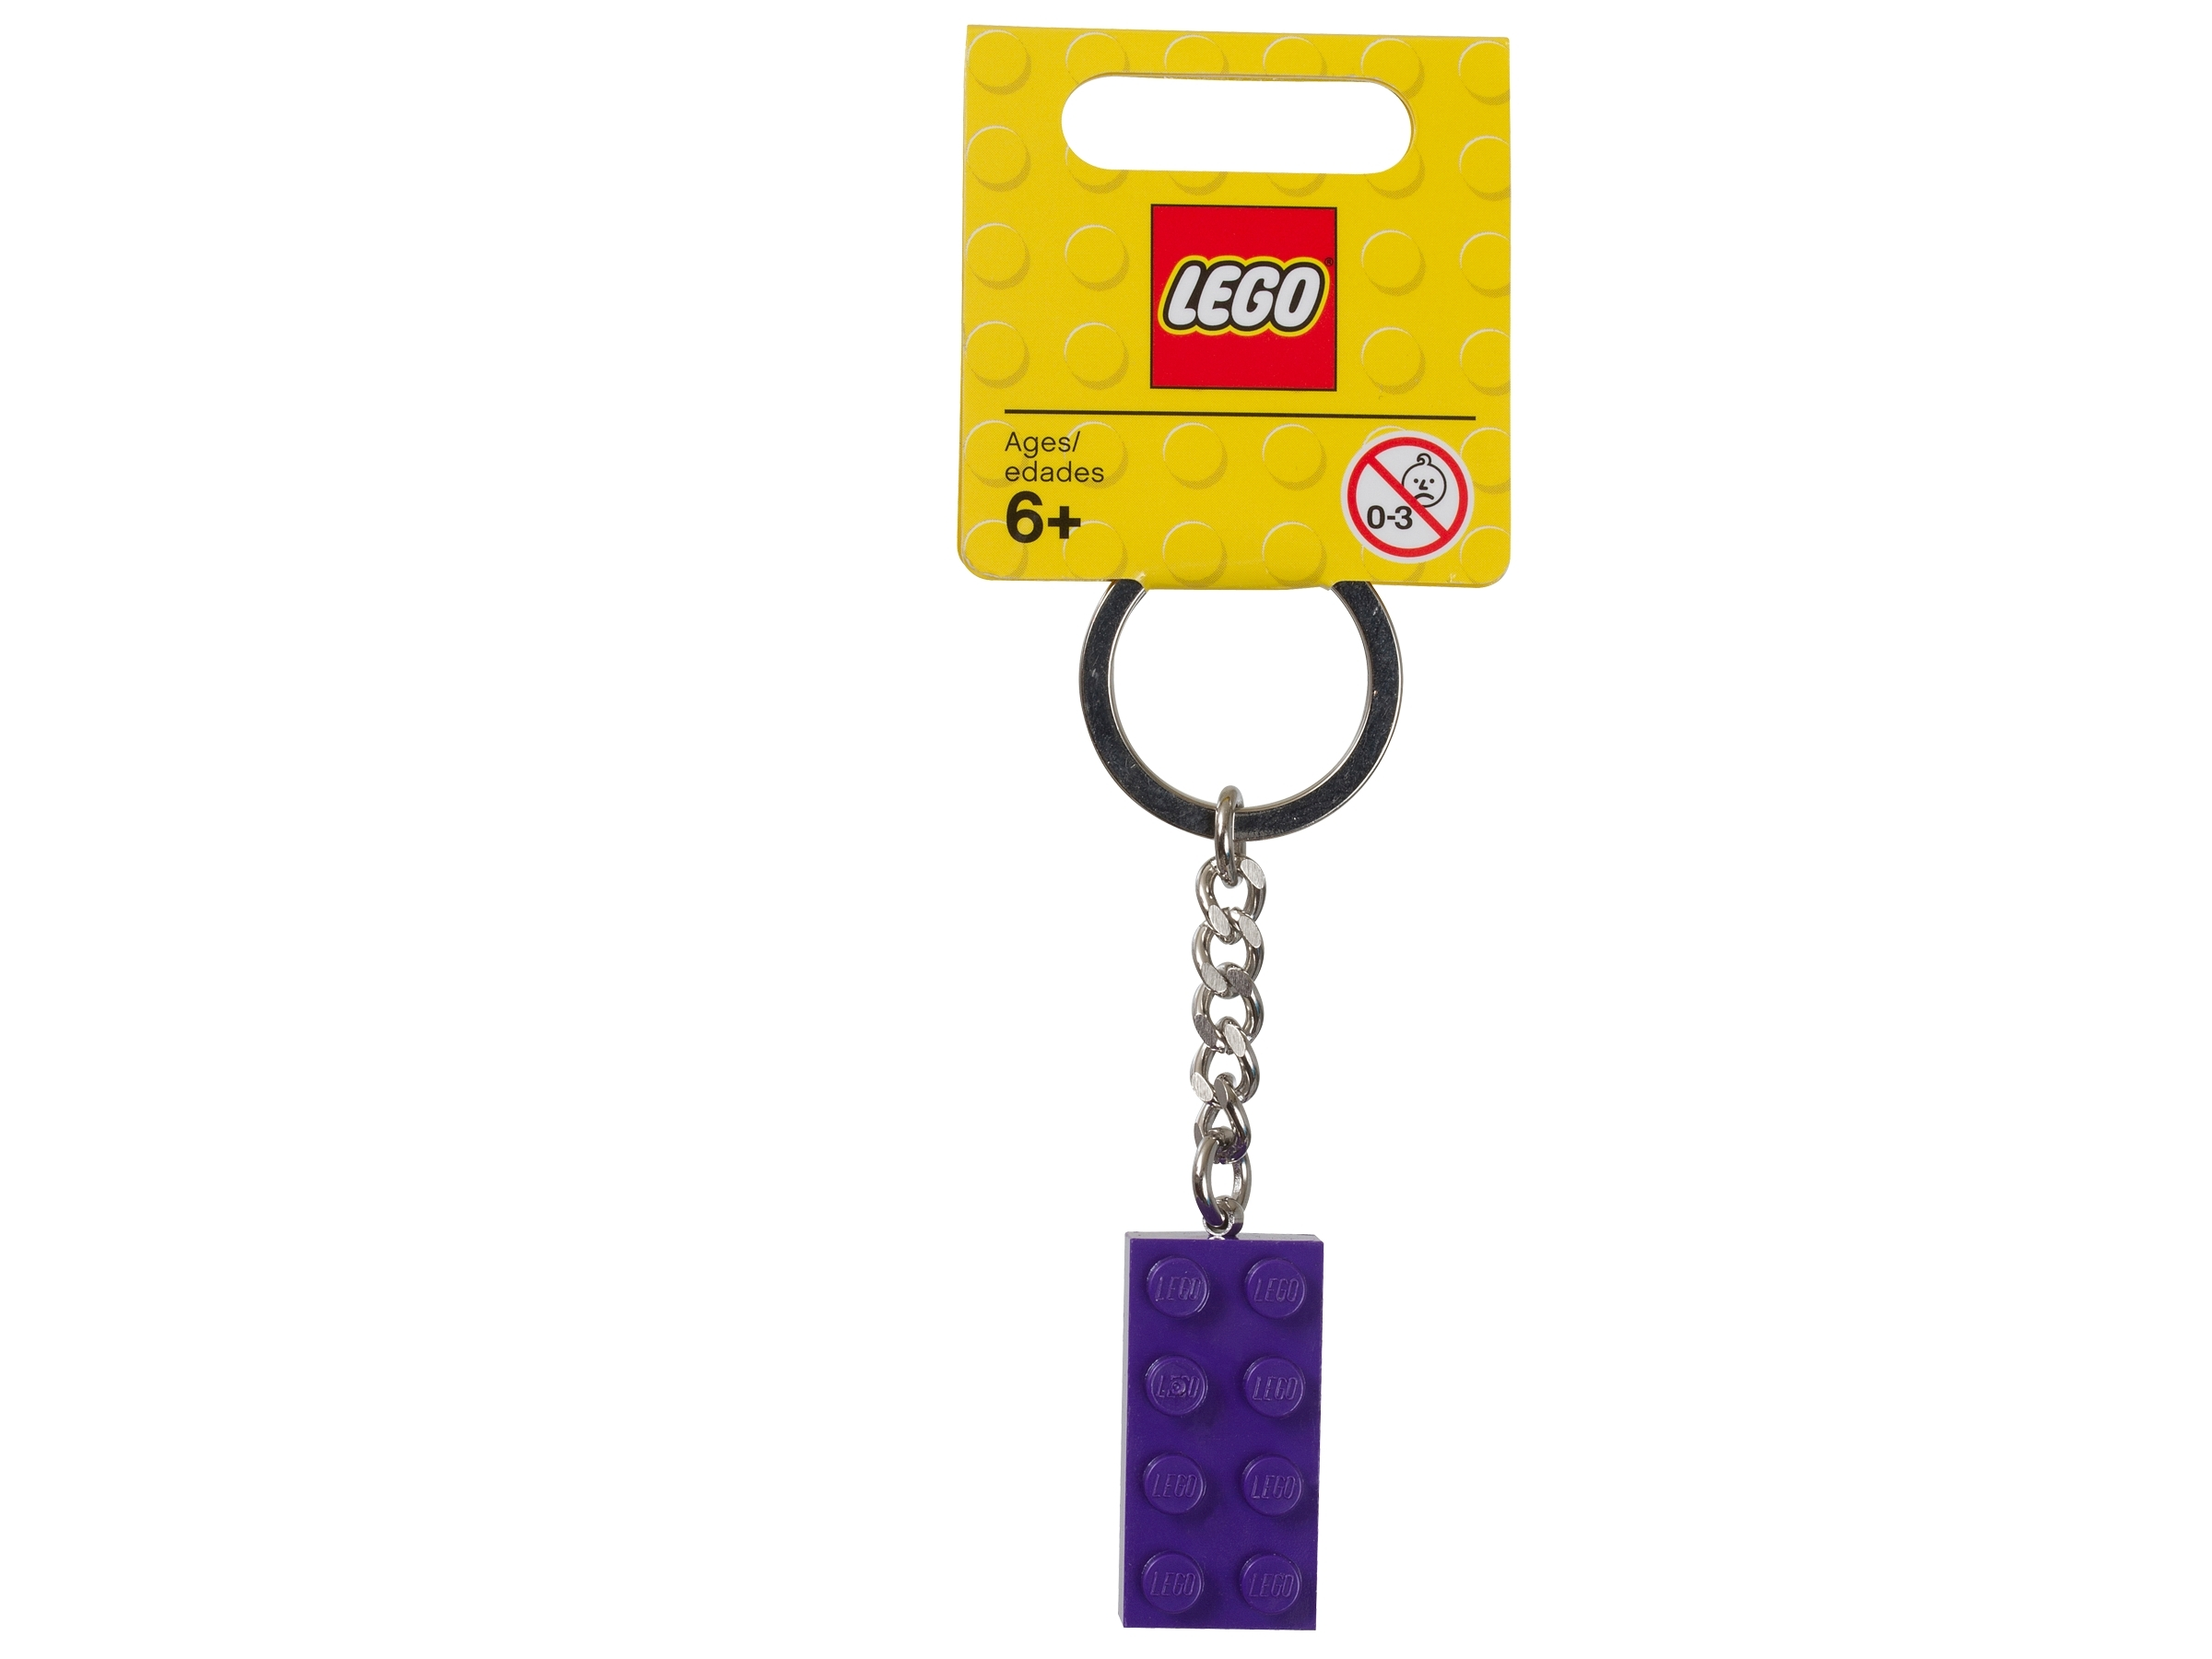 lego 853379 avaimenpera violetti 2x4 nuppinen